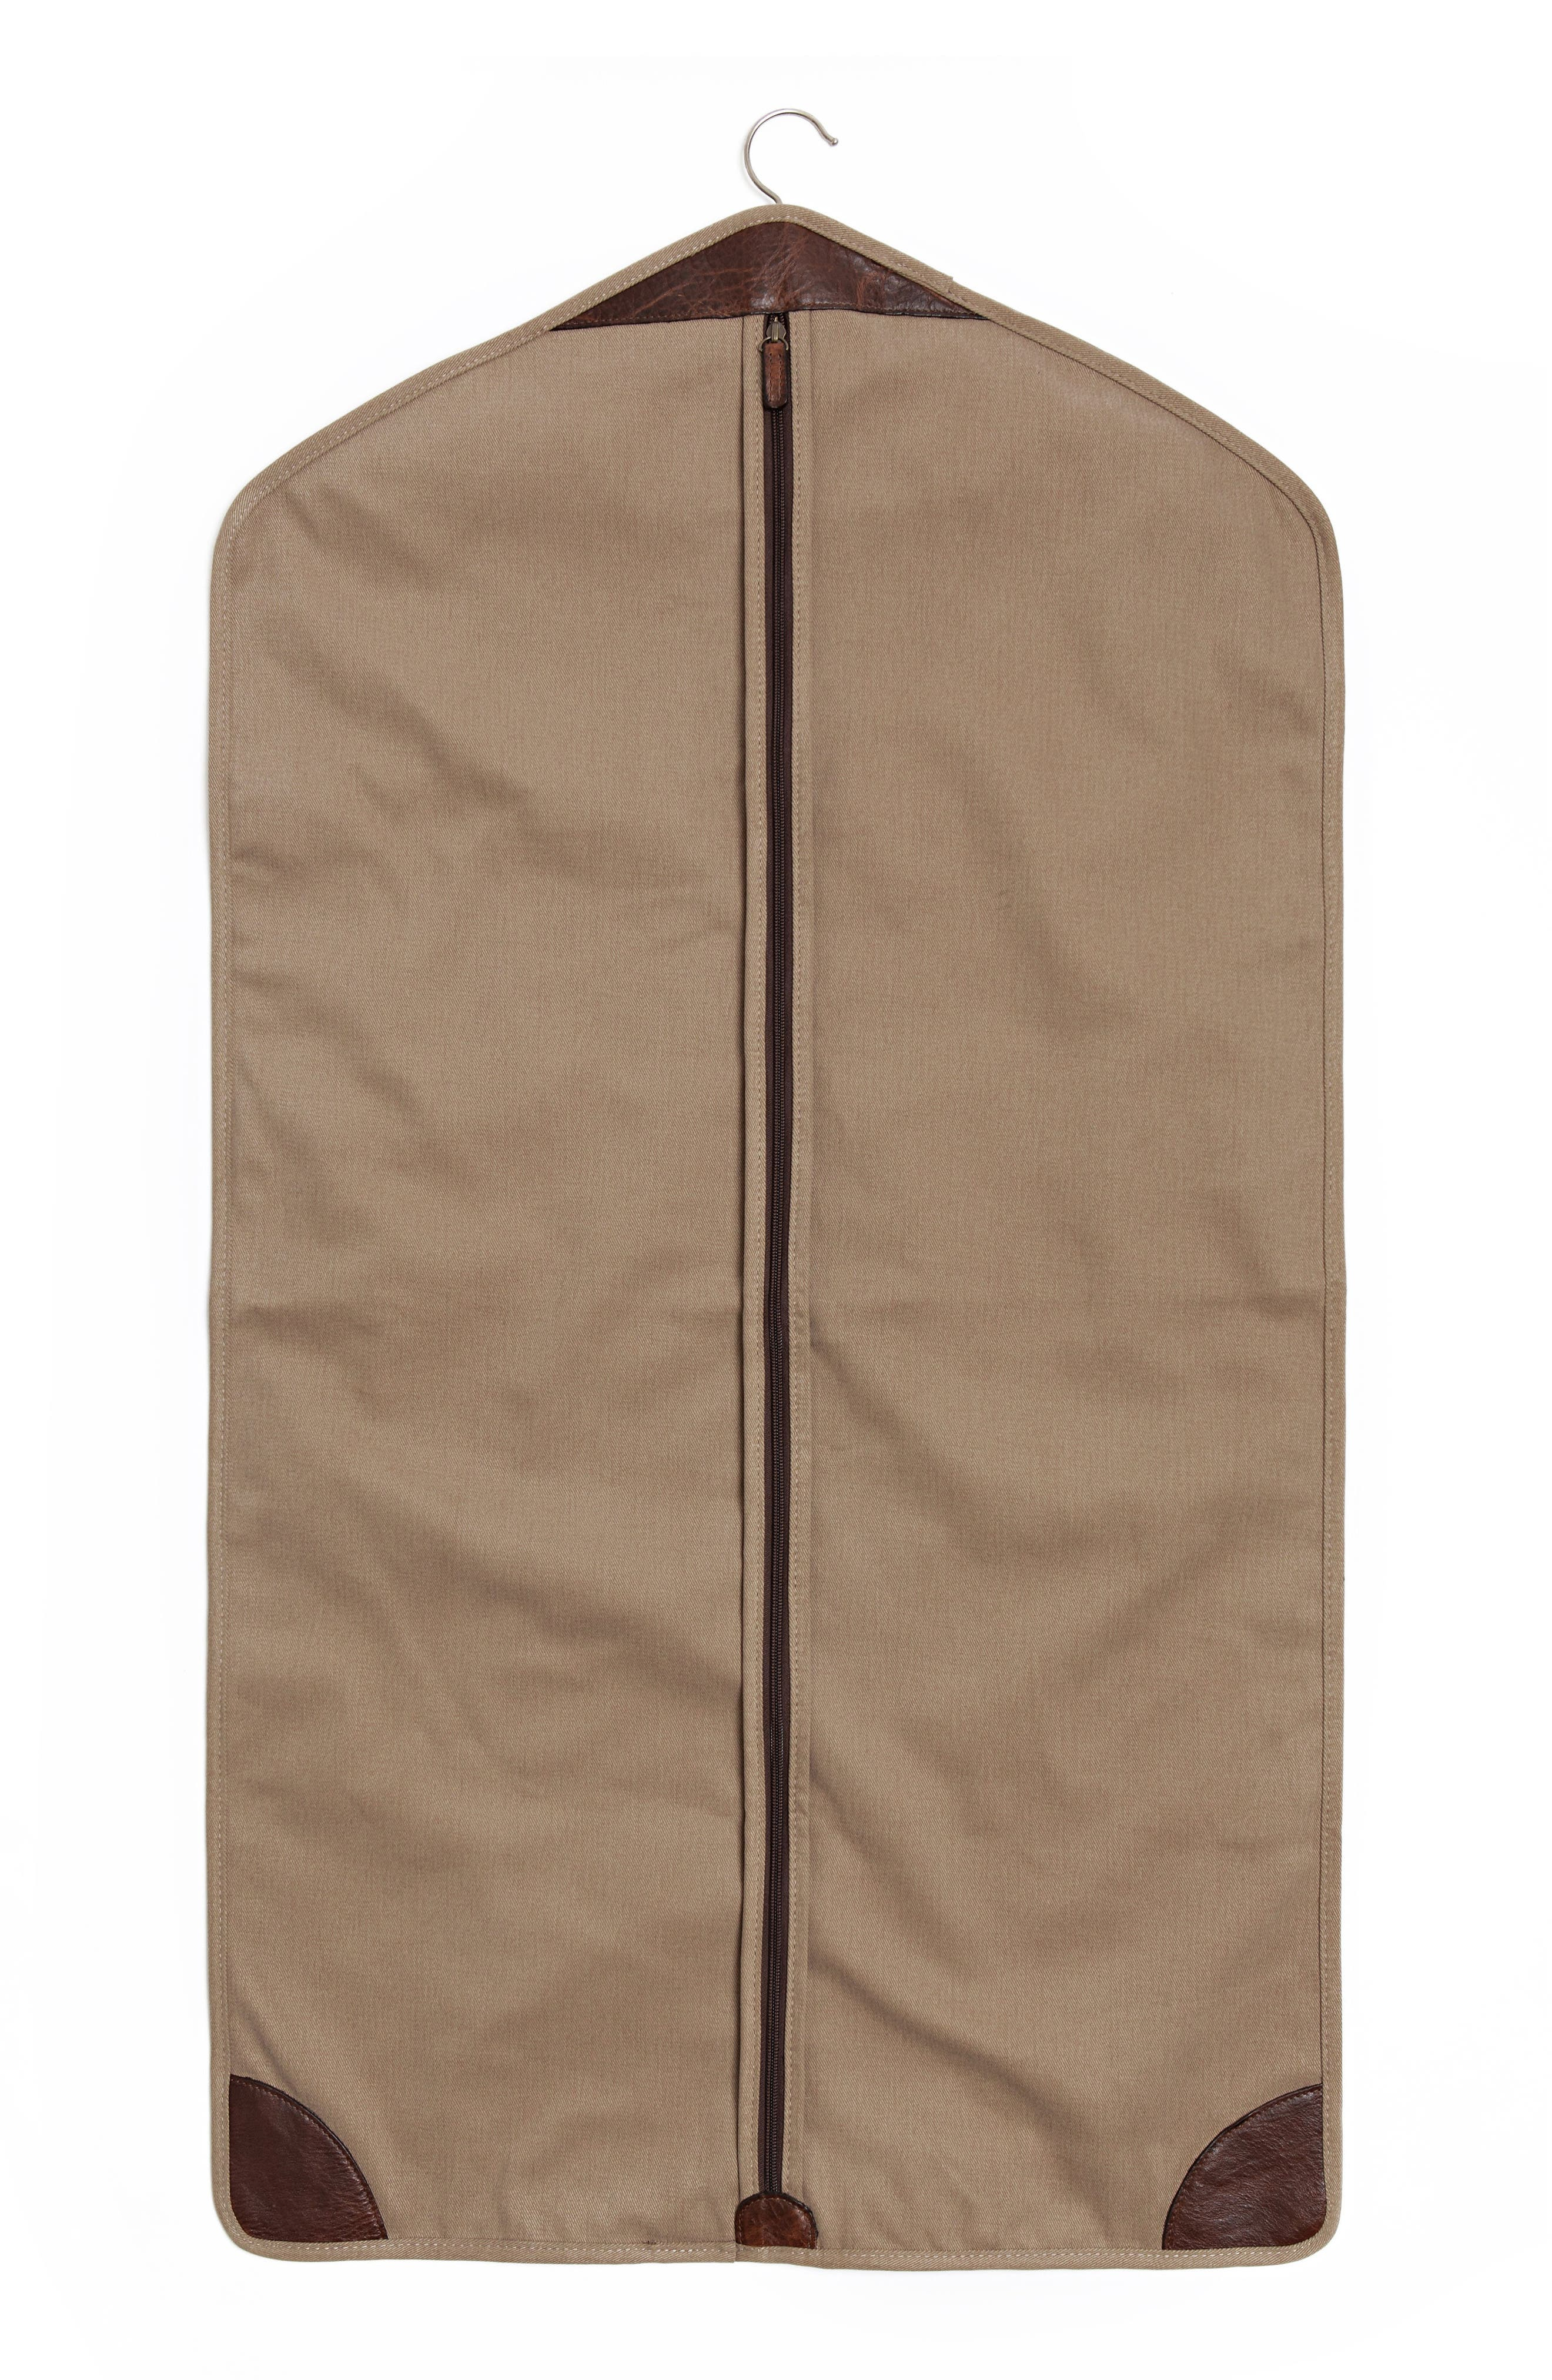 Holton Garment Bag,                             Main thumbnail 1, color,                             206